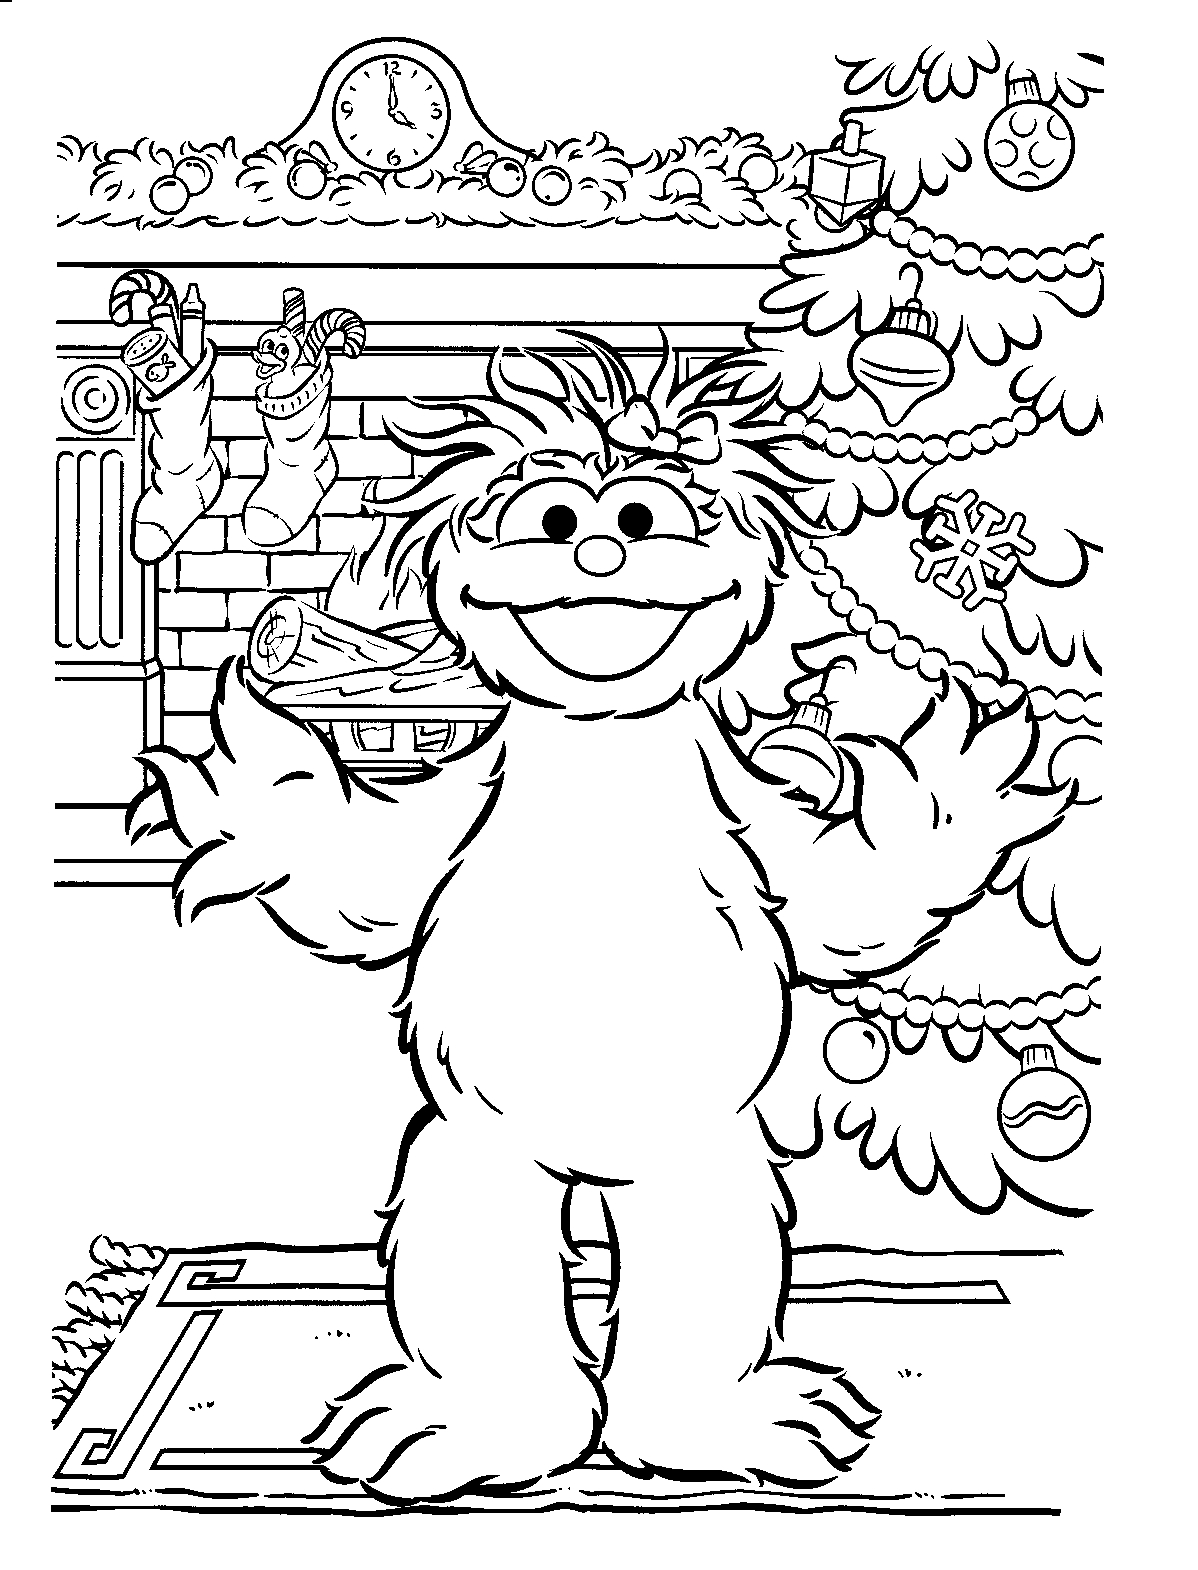 1198x1570 Advice Sesame Street Pictures To Print Free Printable Abby Cadabby